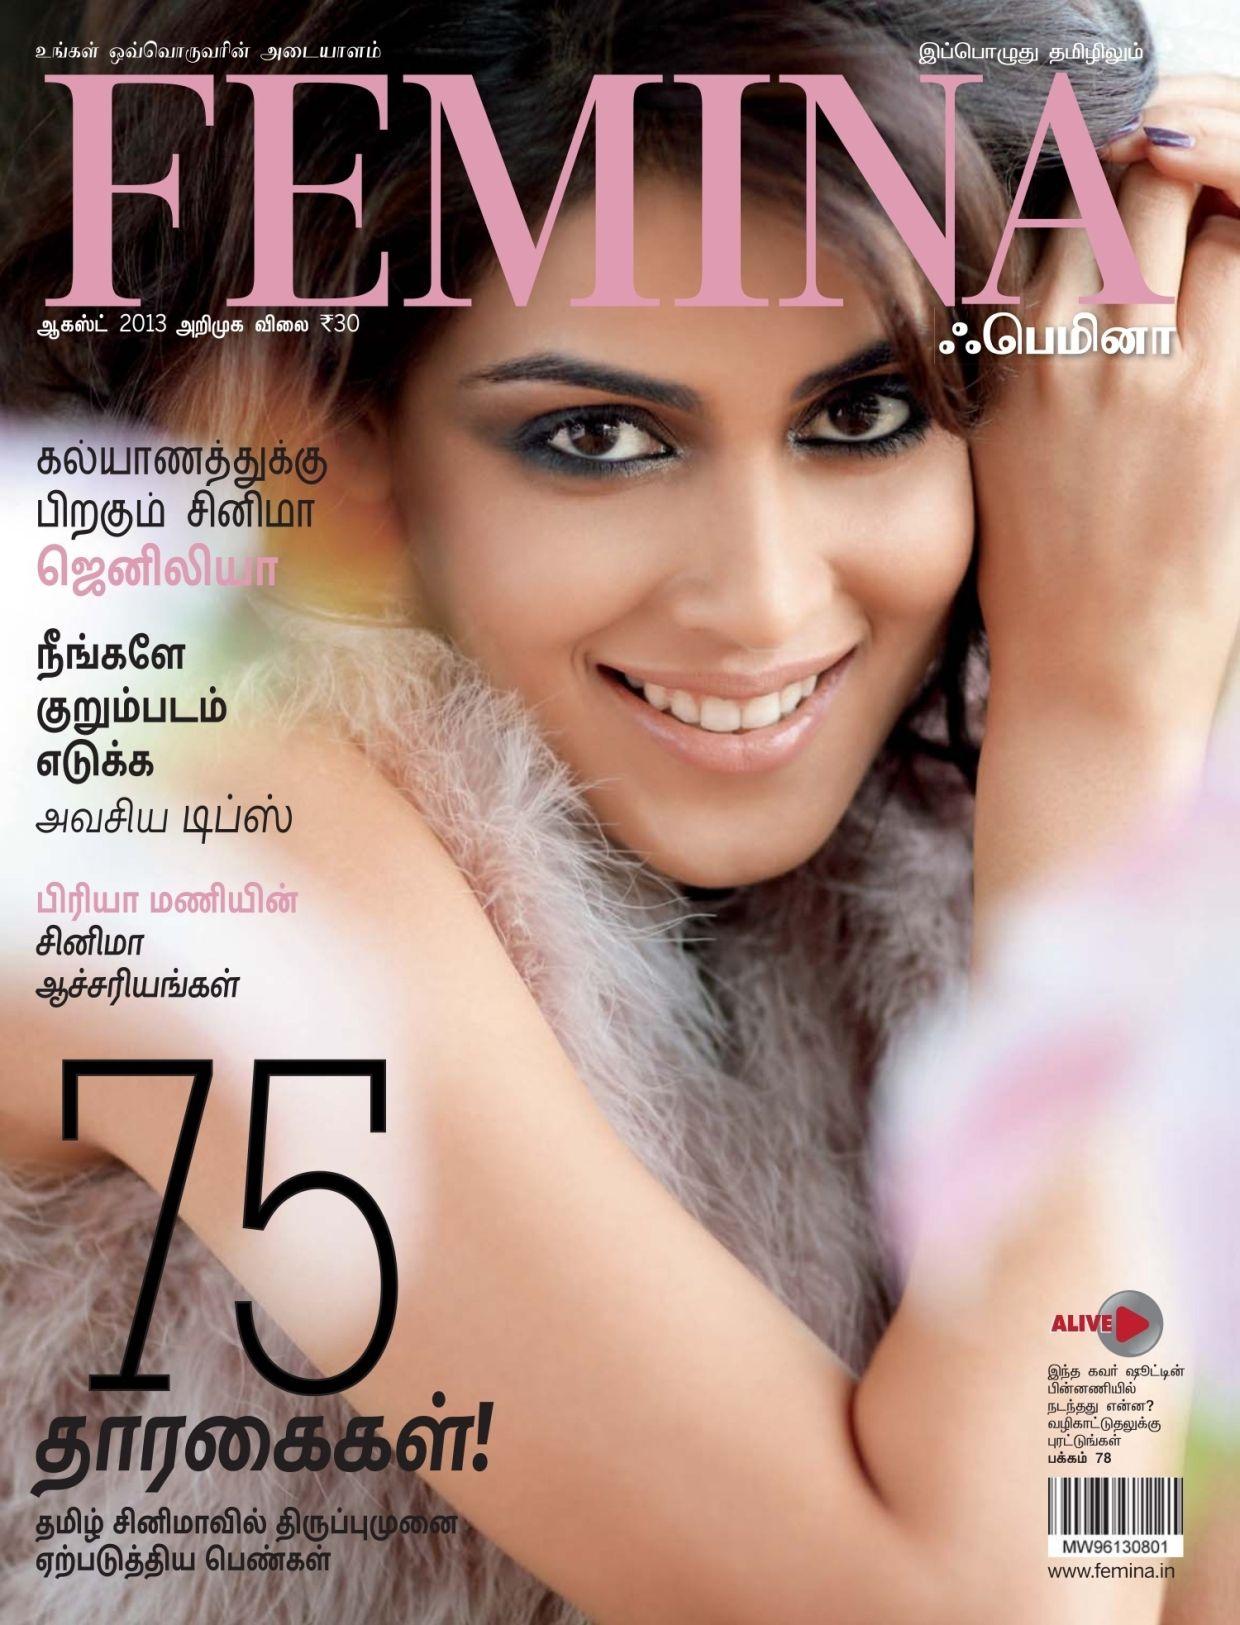 FEMINA Tamil (201308) Genelia D'Souza (With images